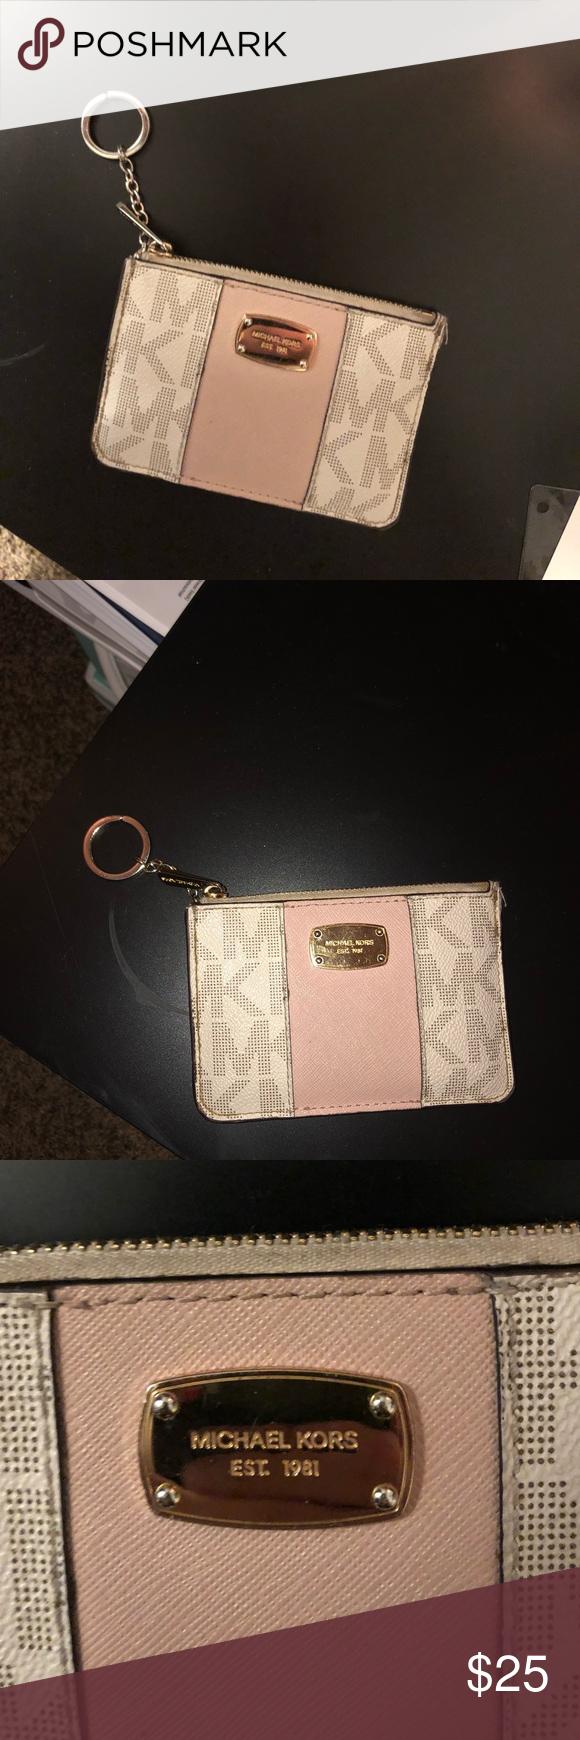 Michael Kors Wristlet Wallet In 2020 Michael Kors Wristlet Wristlet Wallet Simple Wallet